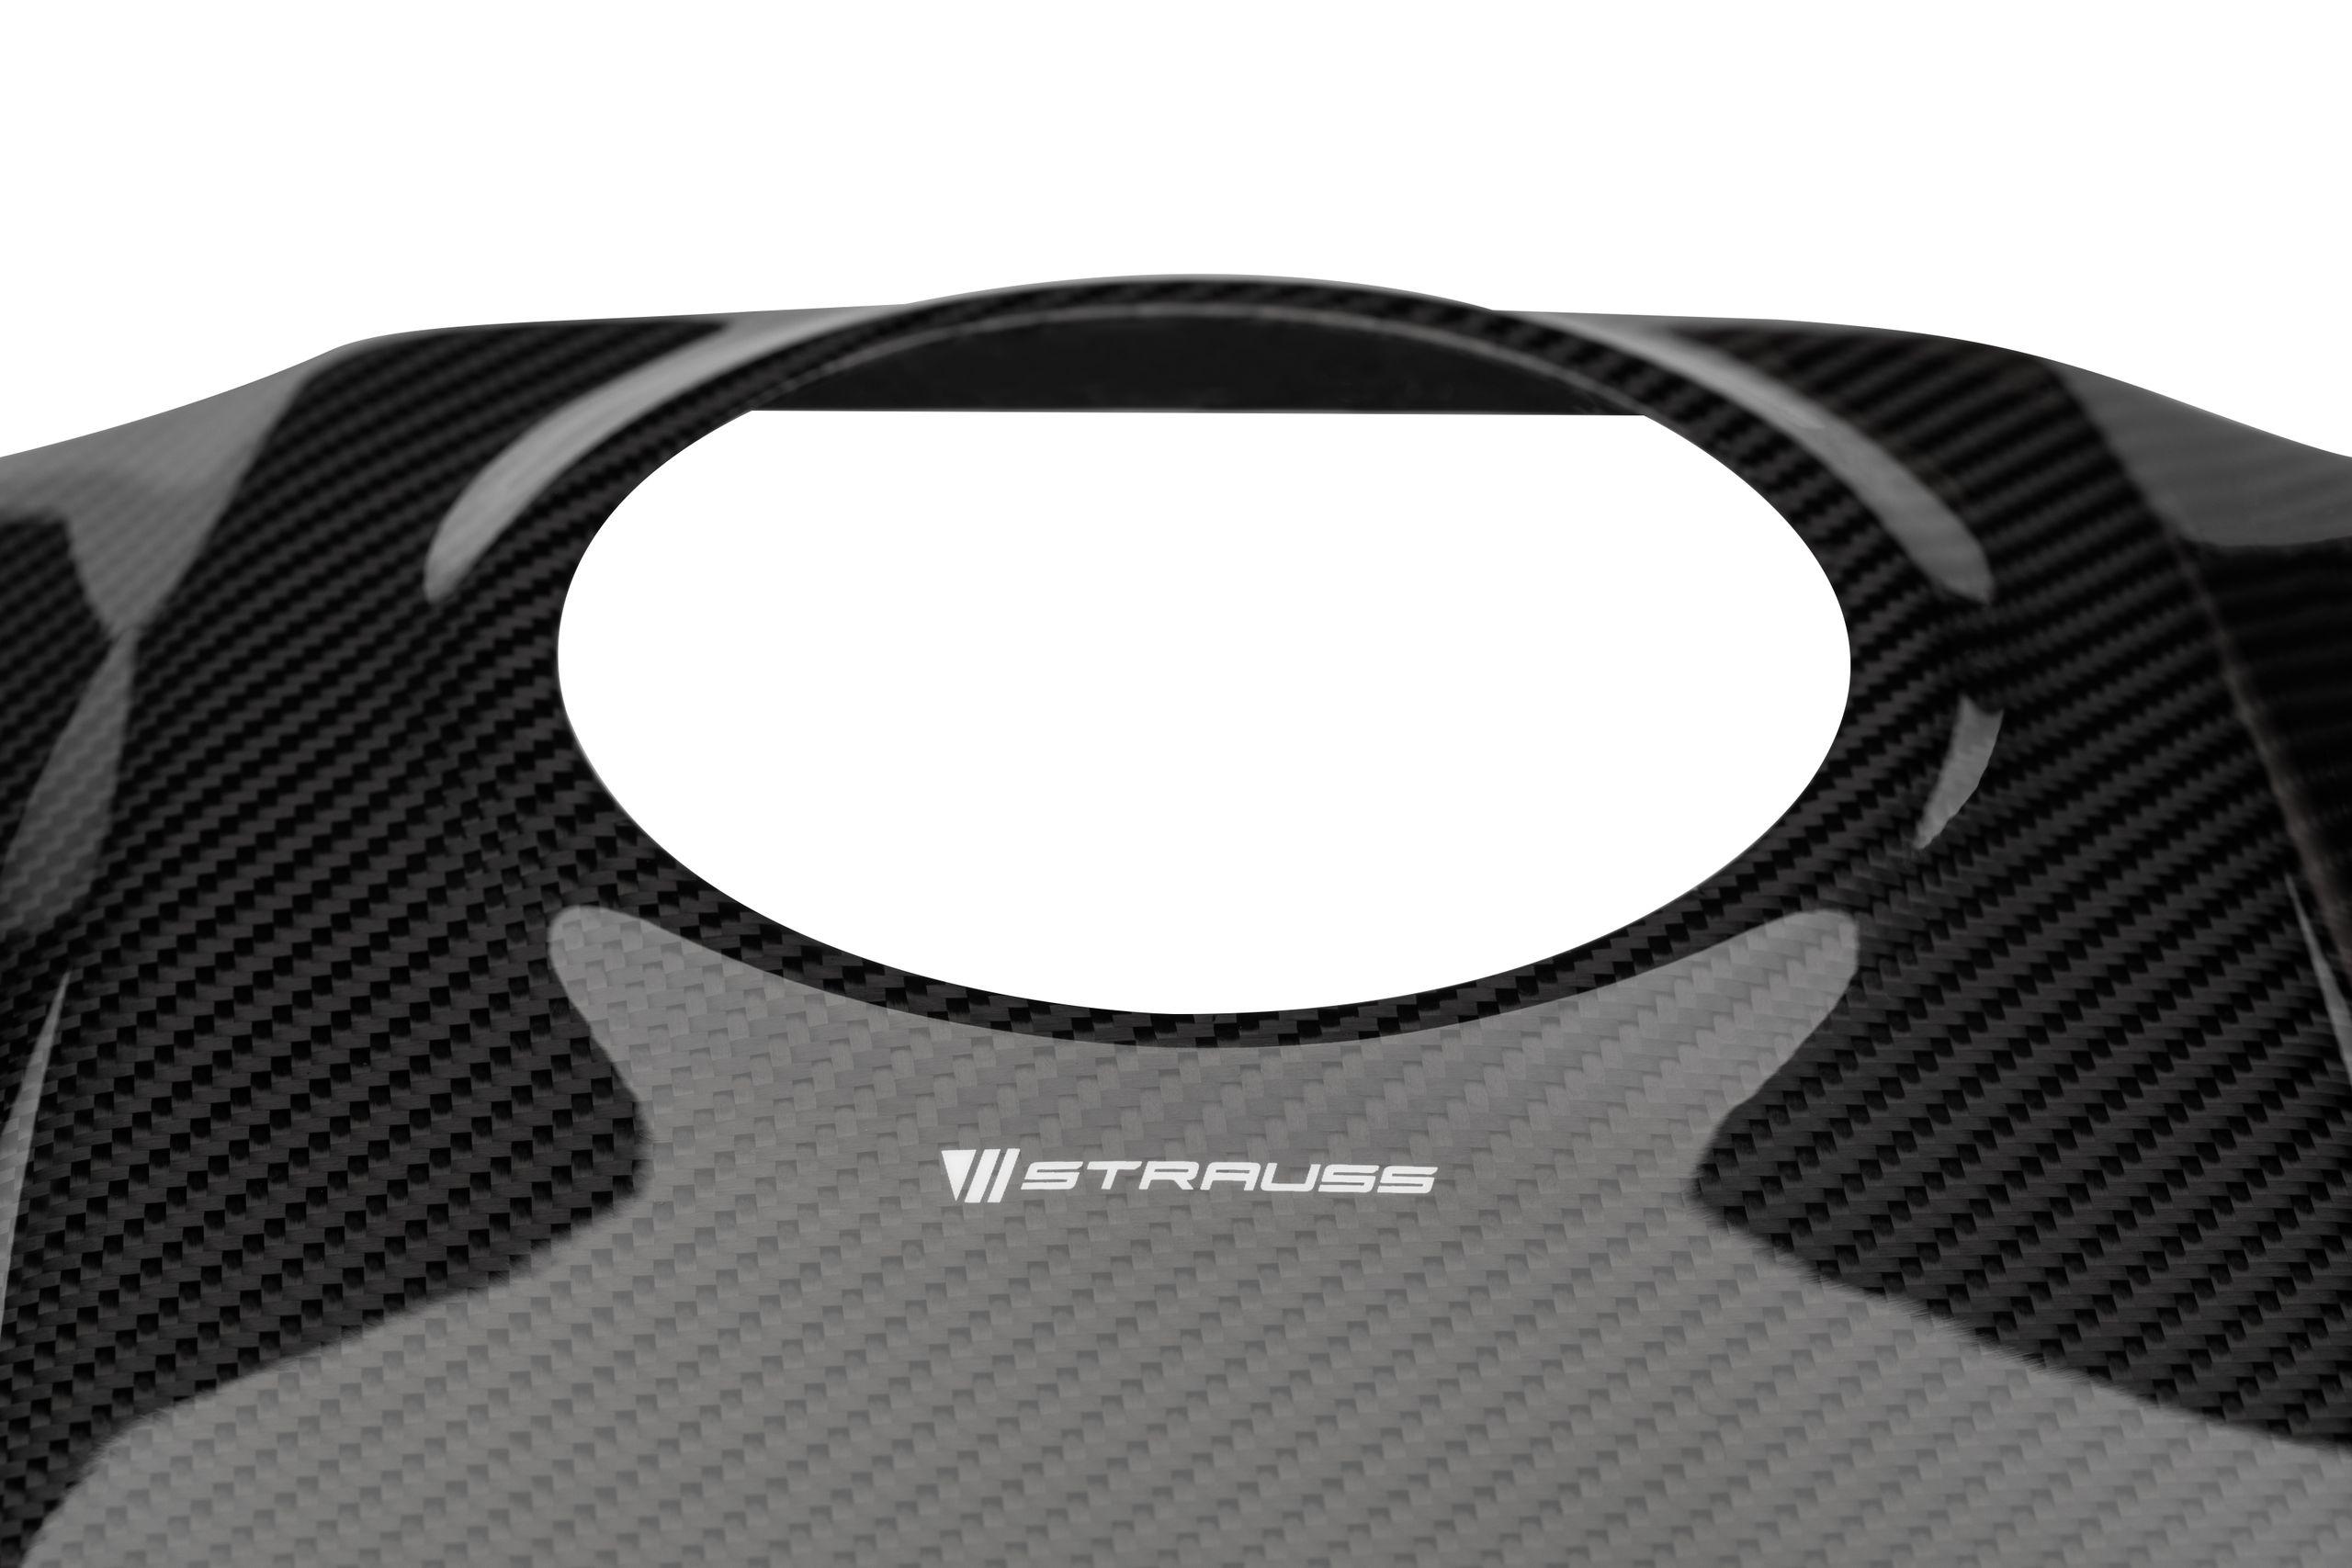 Strauss Yamaha R1 R1M Carbon Fibre Tank Cover Large Shroud 2015-2020+